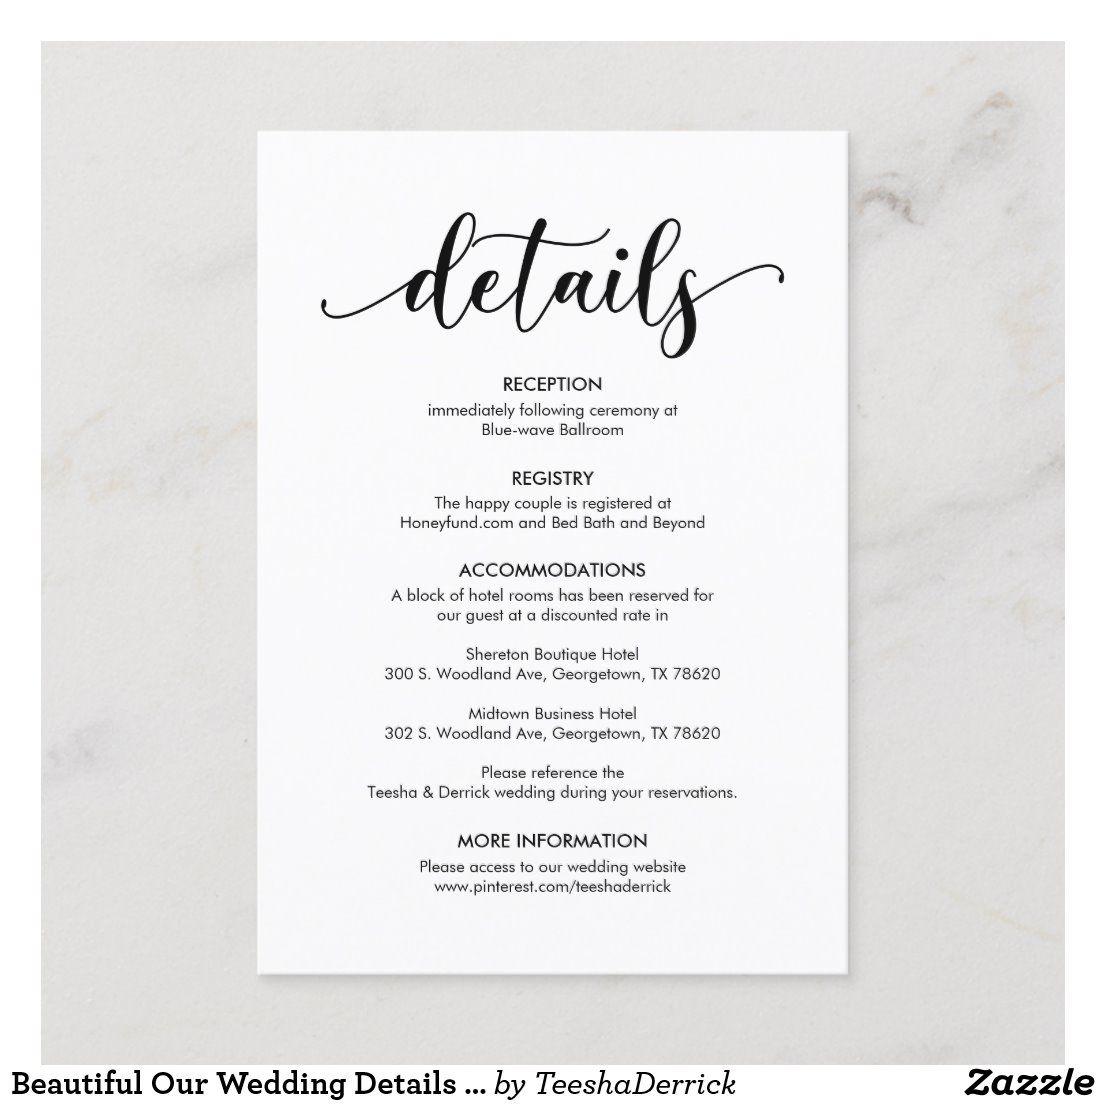 Beautiful Our Wedding Details Modern Rustic Black Enclosure Card Zazzle Com Wedding Invitation Details Card Wedding Website Examples Wedding Invitation Wording Examples